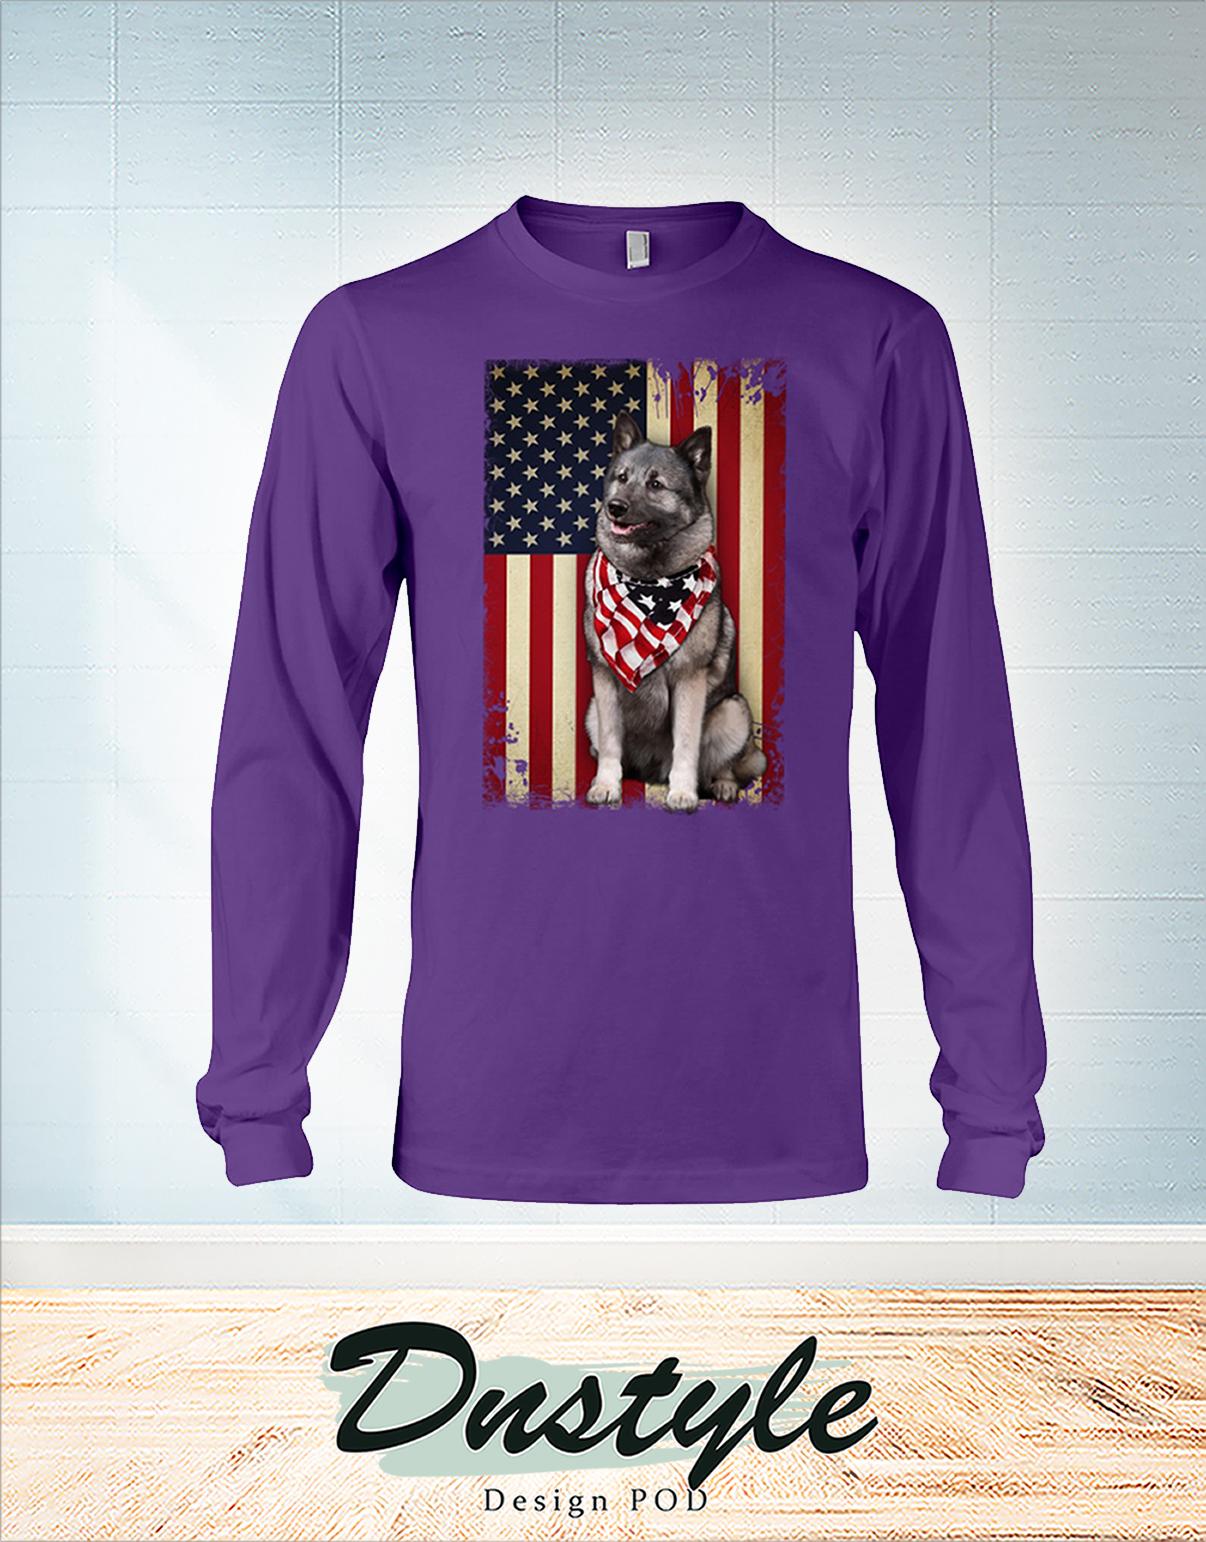 Norwegian Elkhound smile american flag 4th of July long sleeve